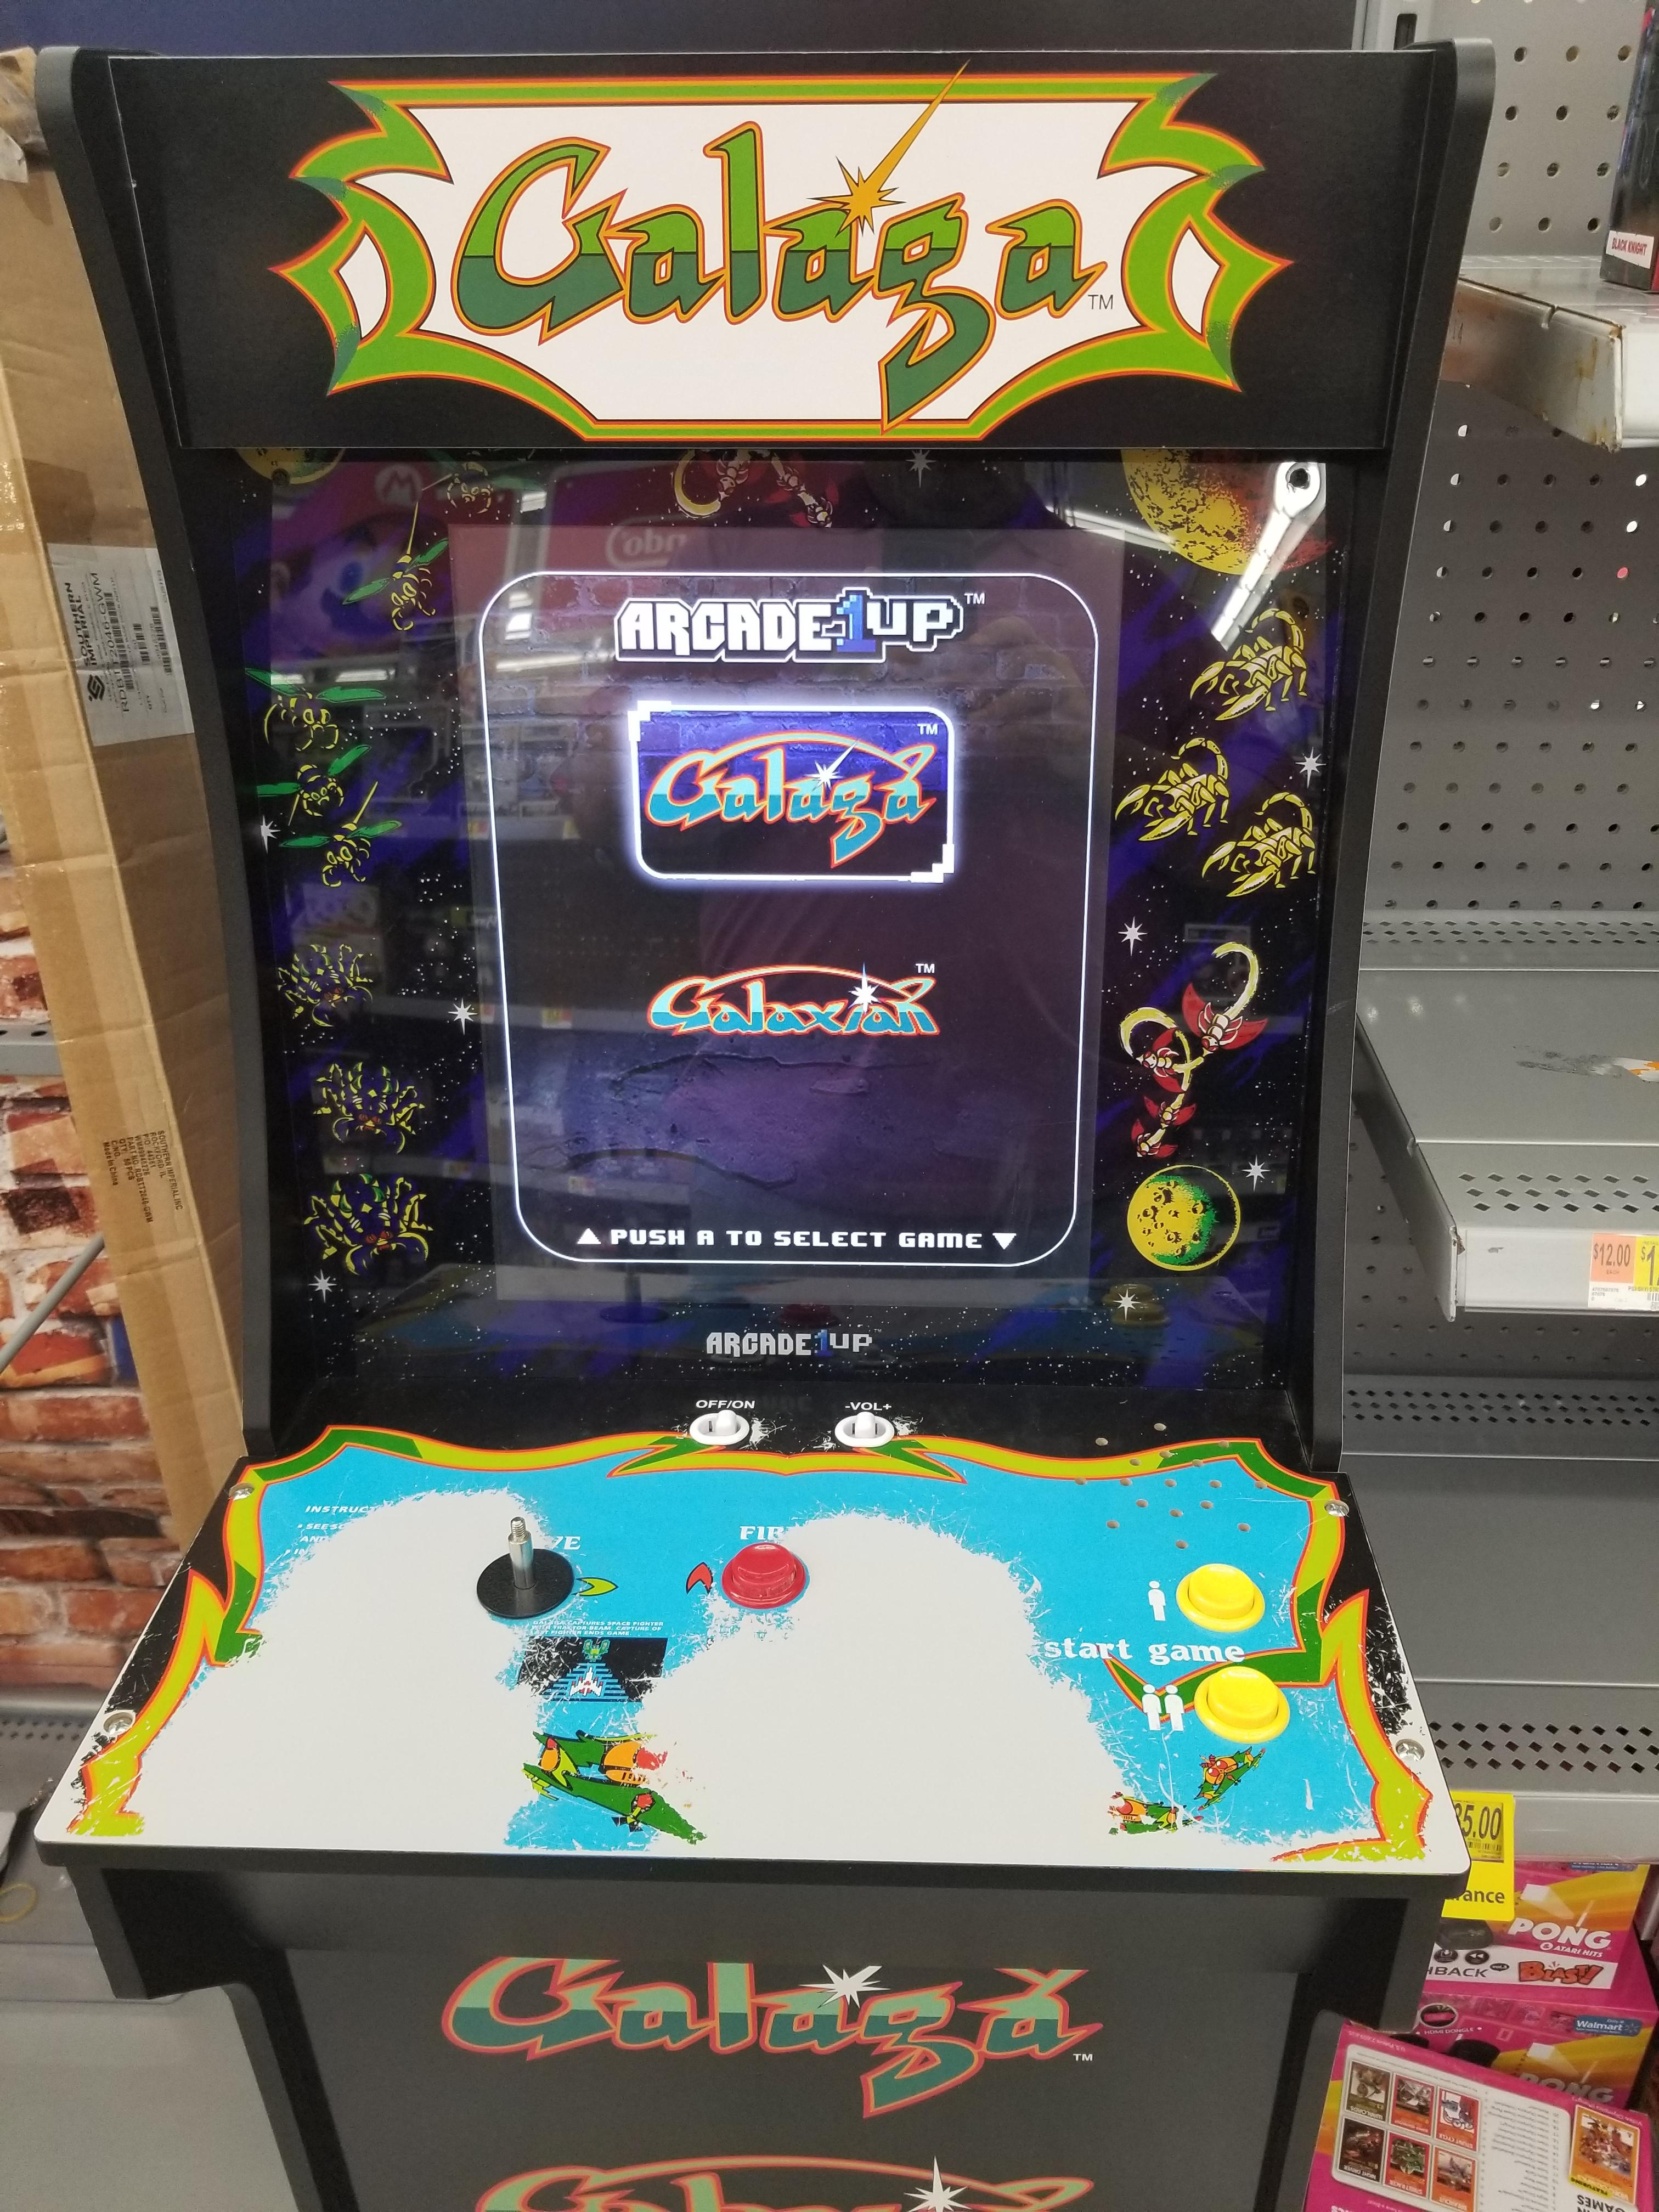 Arcade 1UP - Social Club - Spesoft Forums